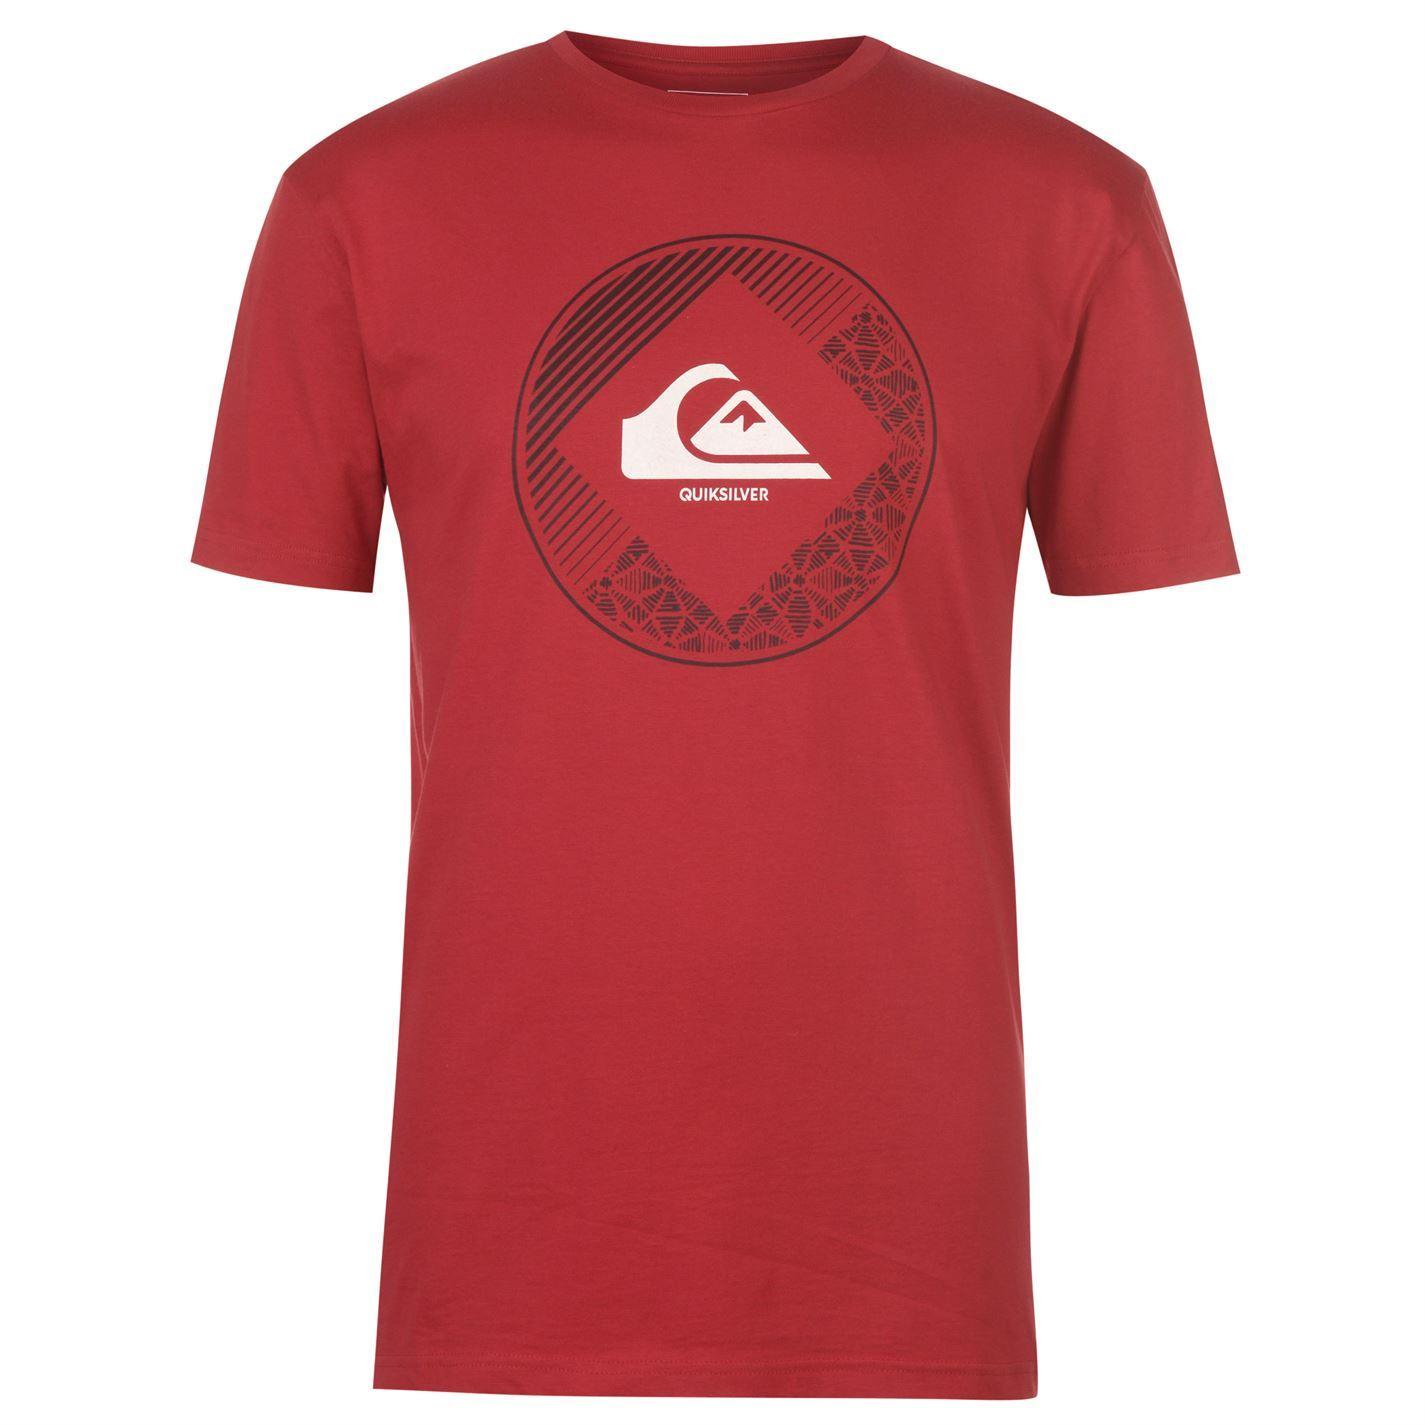 Quiksilver-Diamond-Logo-T-Shirt-Mens-Top-Tee-Shirt-White-Small thumbnail 4